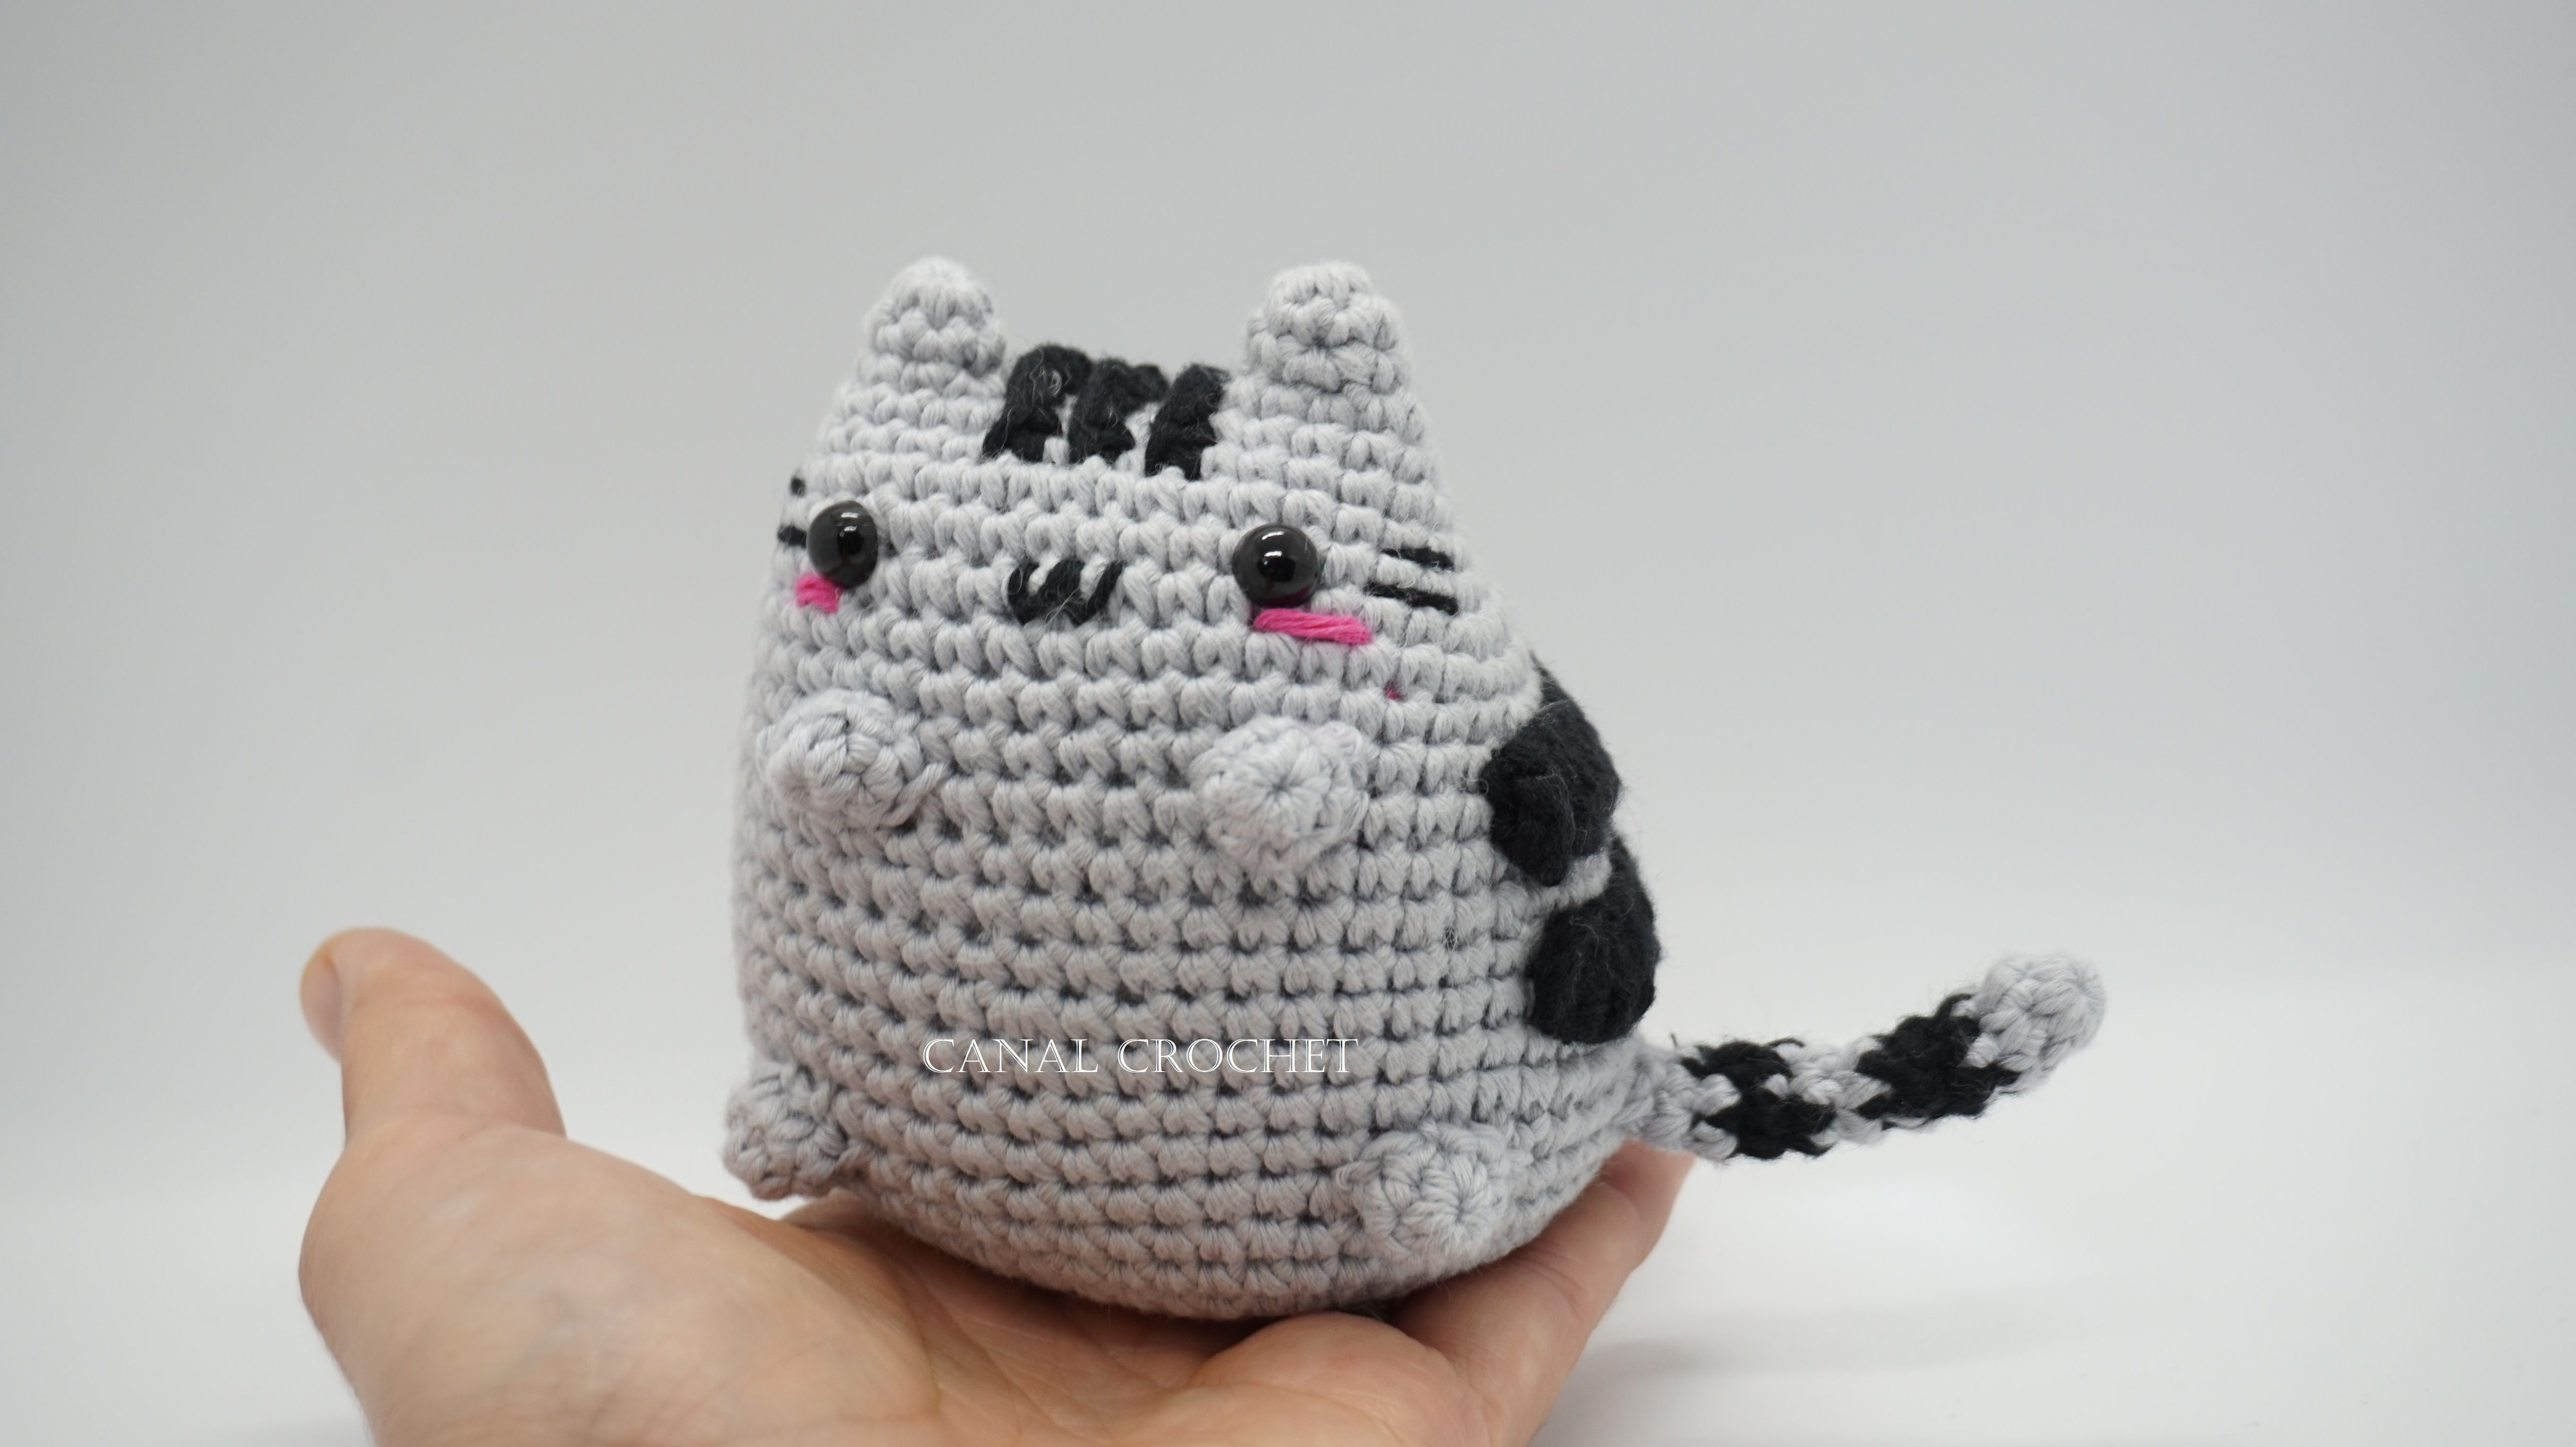 Gato kawaii amigurumi en youtube , canal crochet. | Mini | Pinterest ...